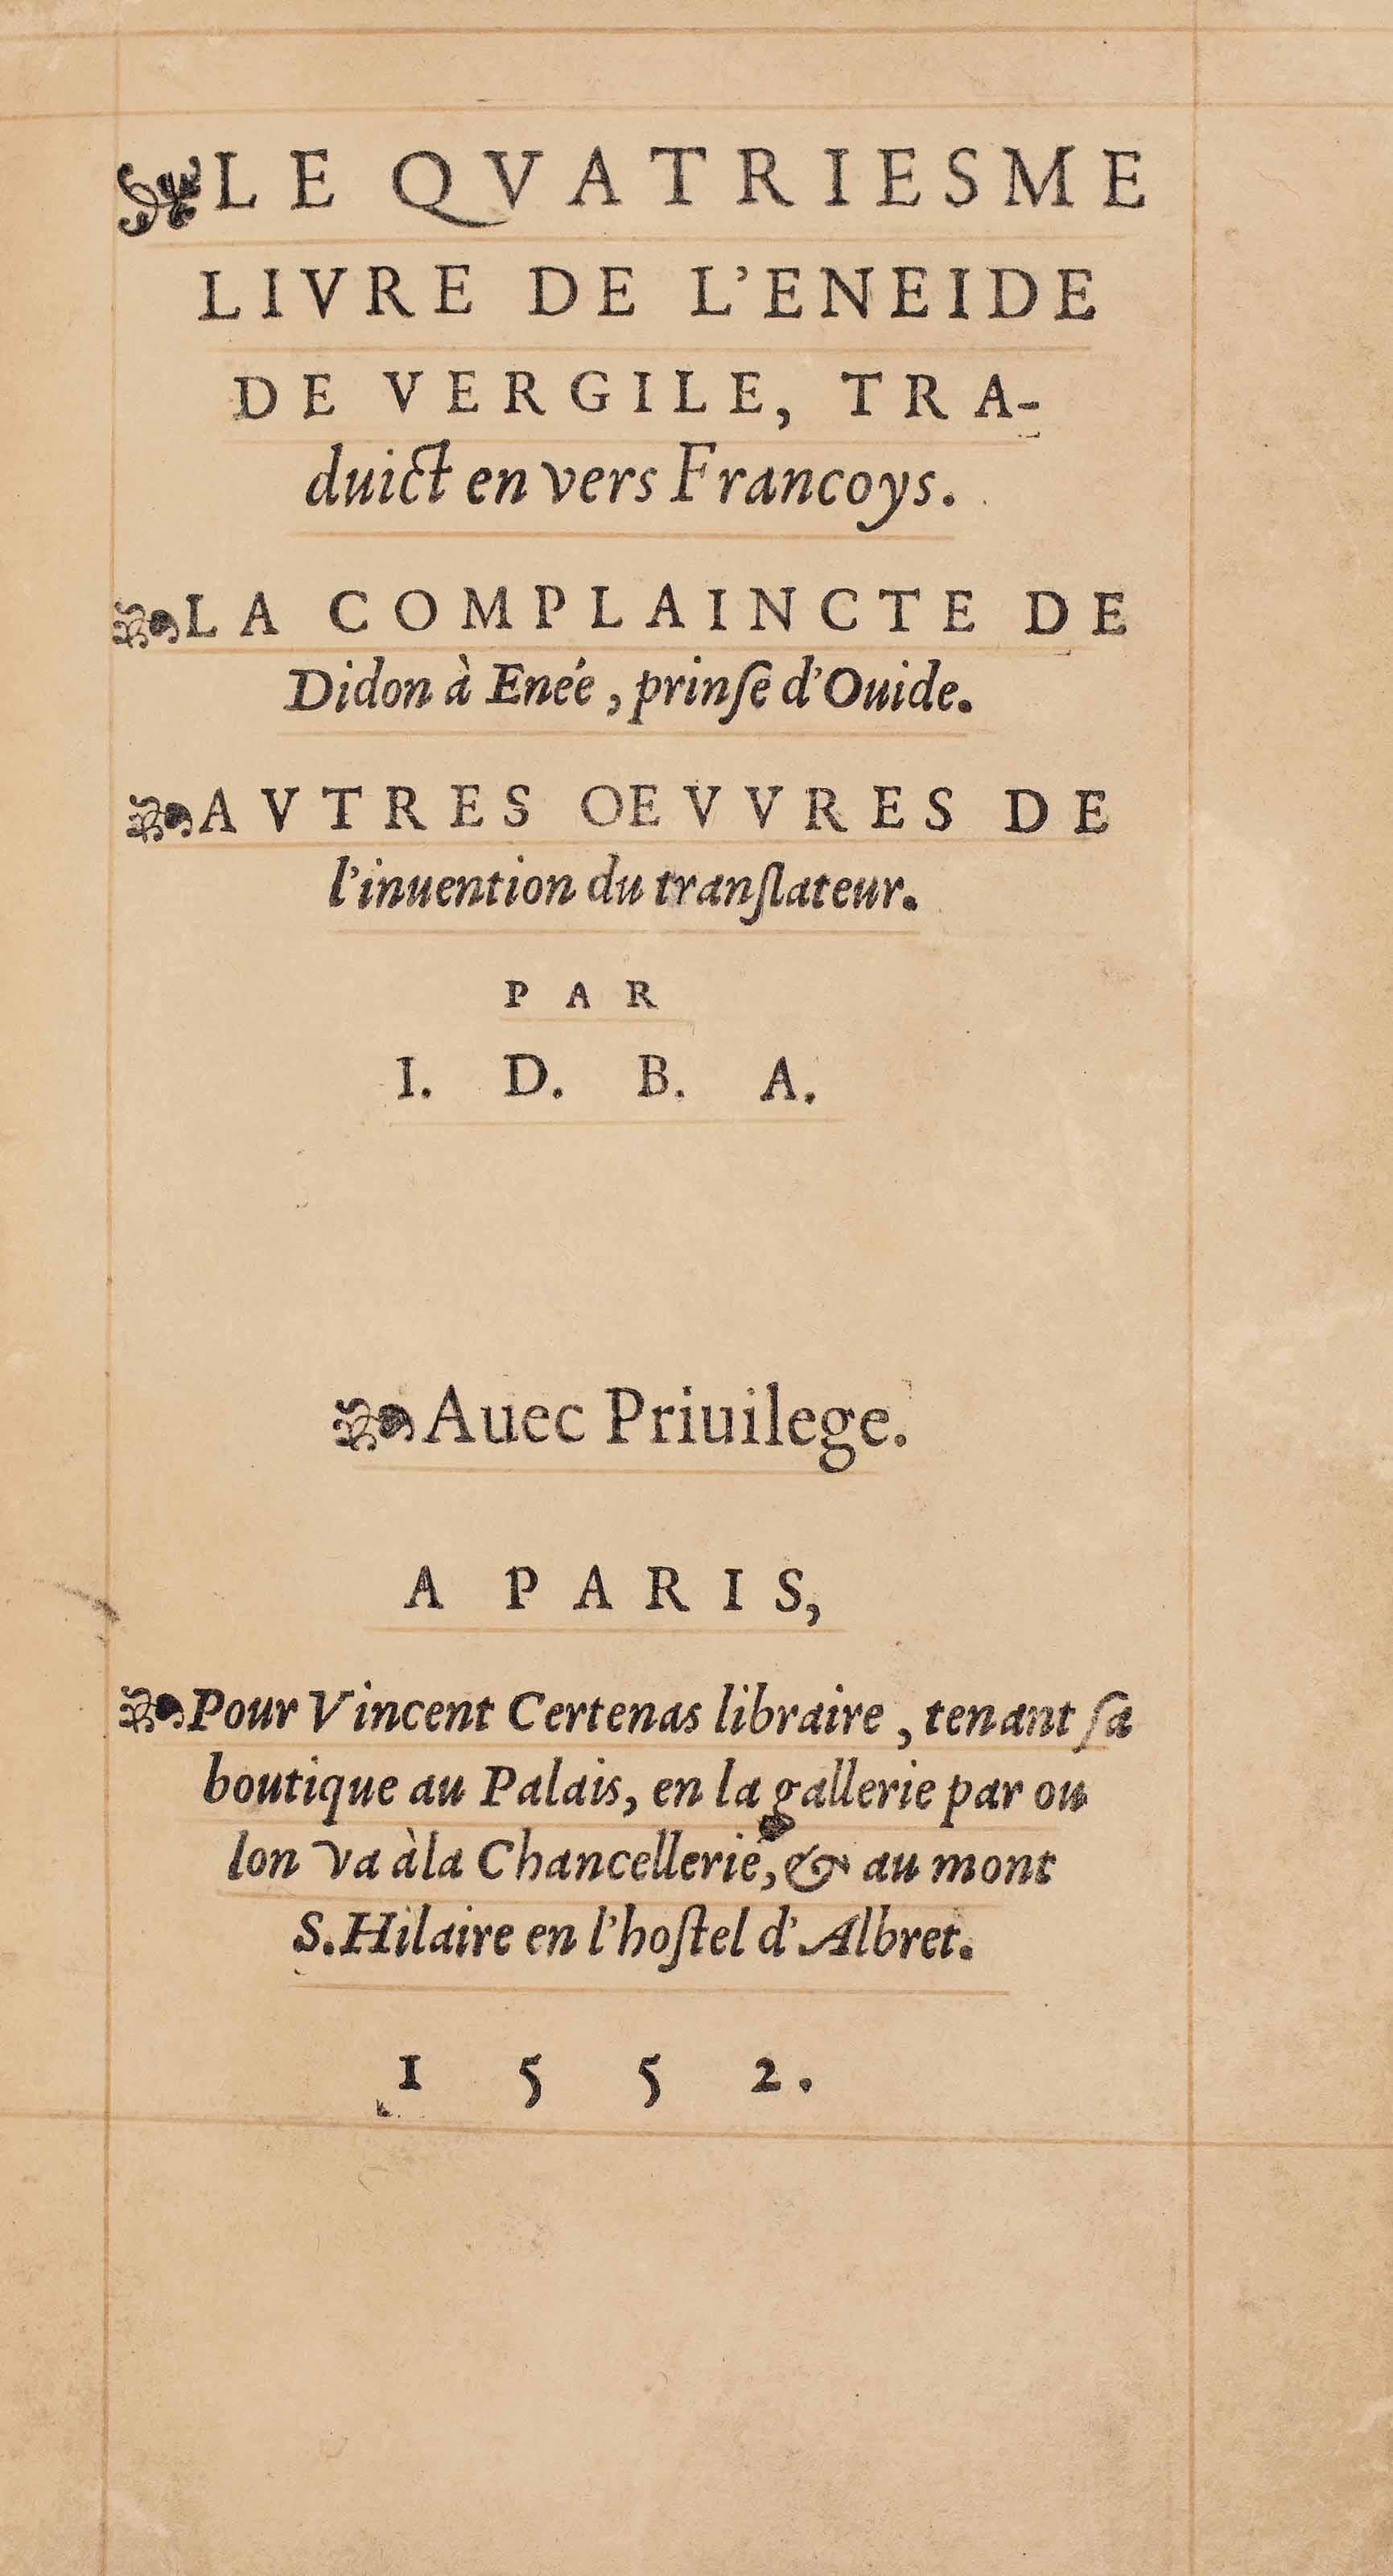 Joachim DU BELLAY (vers 1522-1